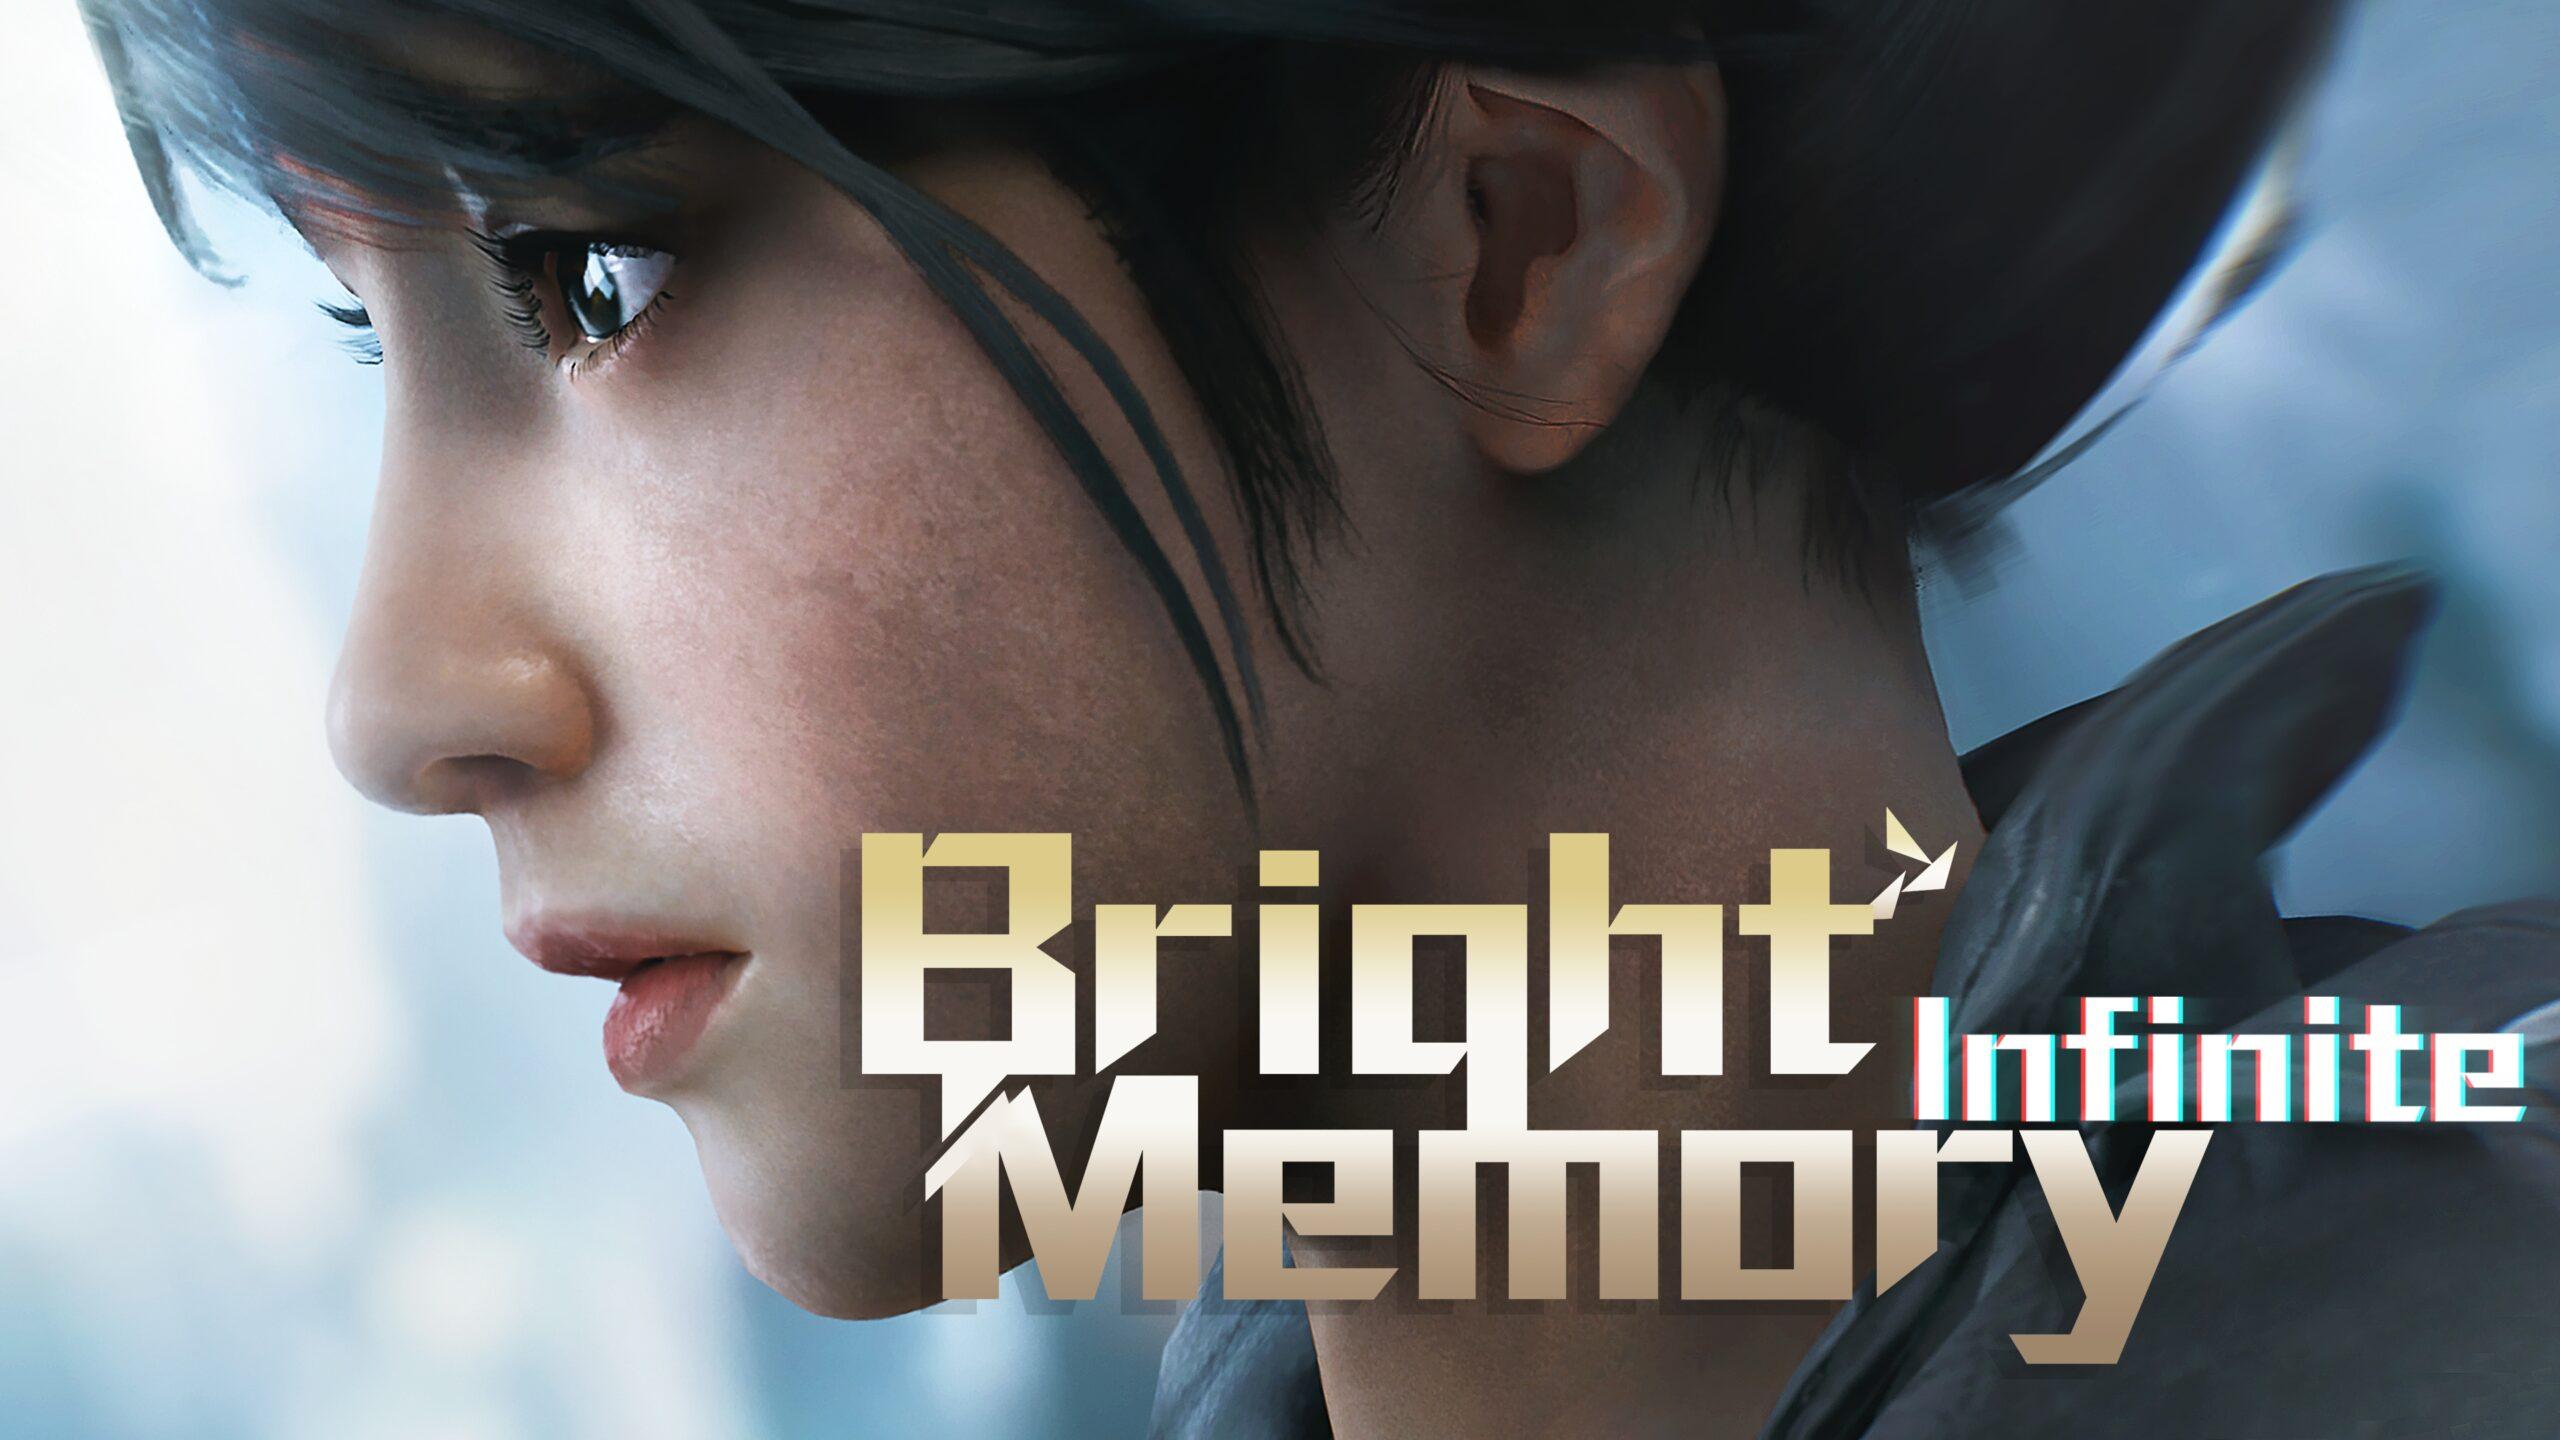 Bright-Memory-Infinite_2021_02-11-21_007